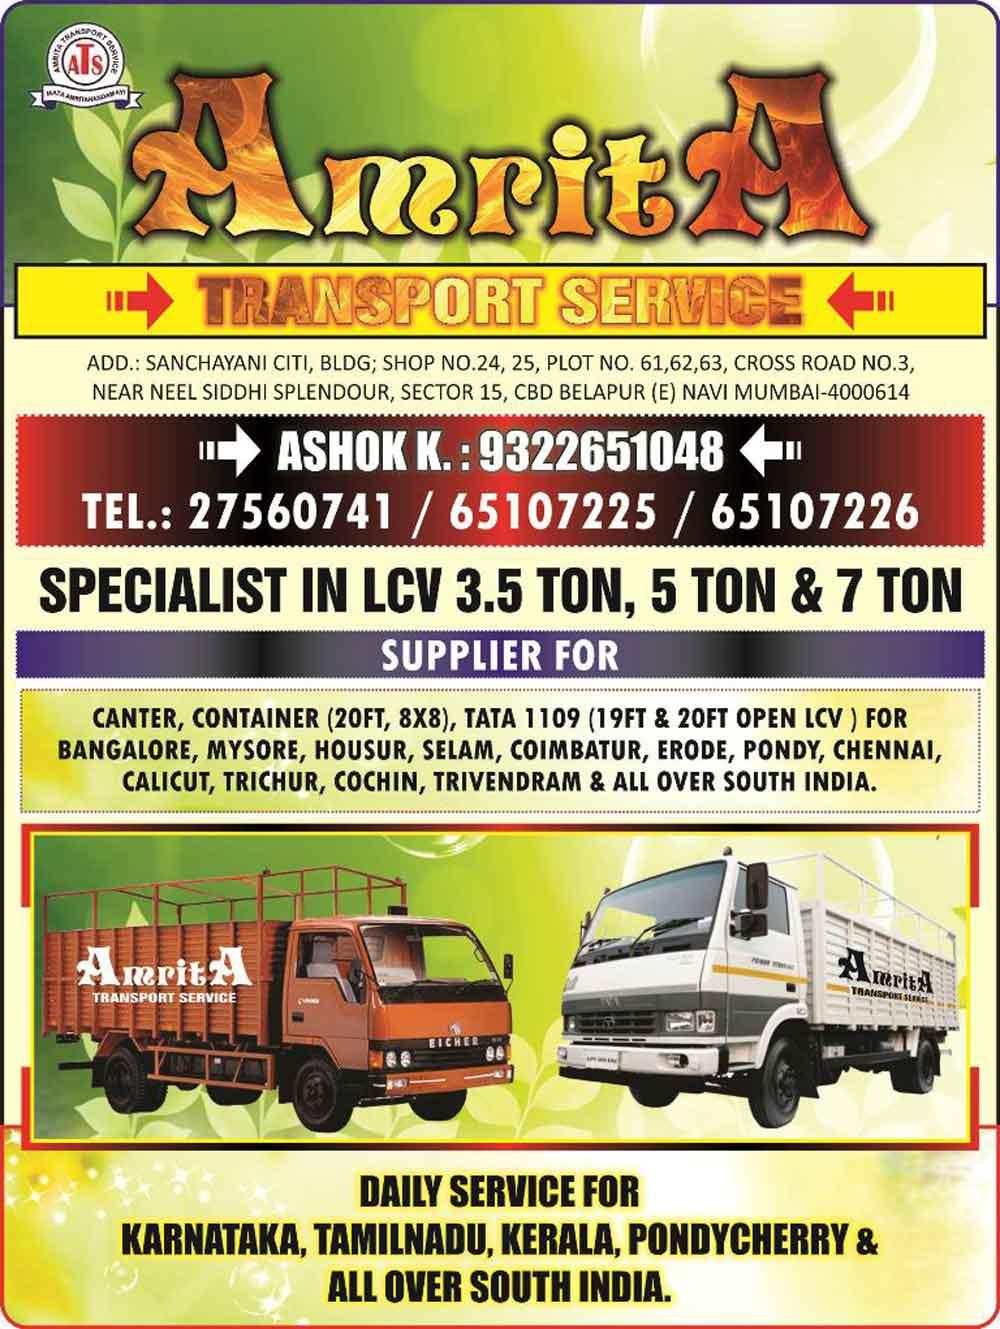 Amrita Transport Service